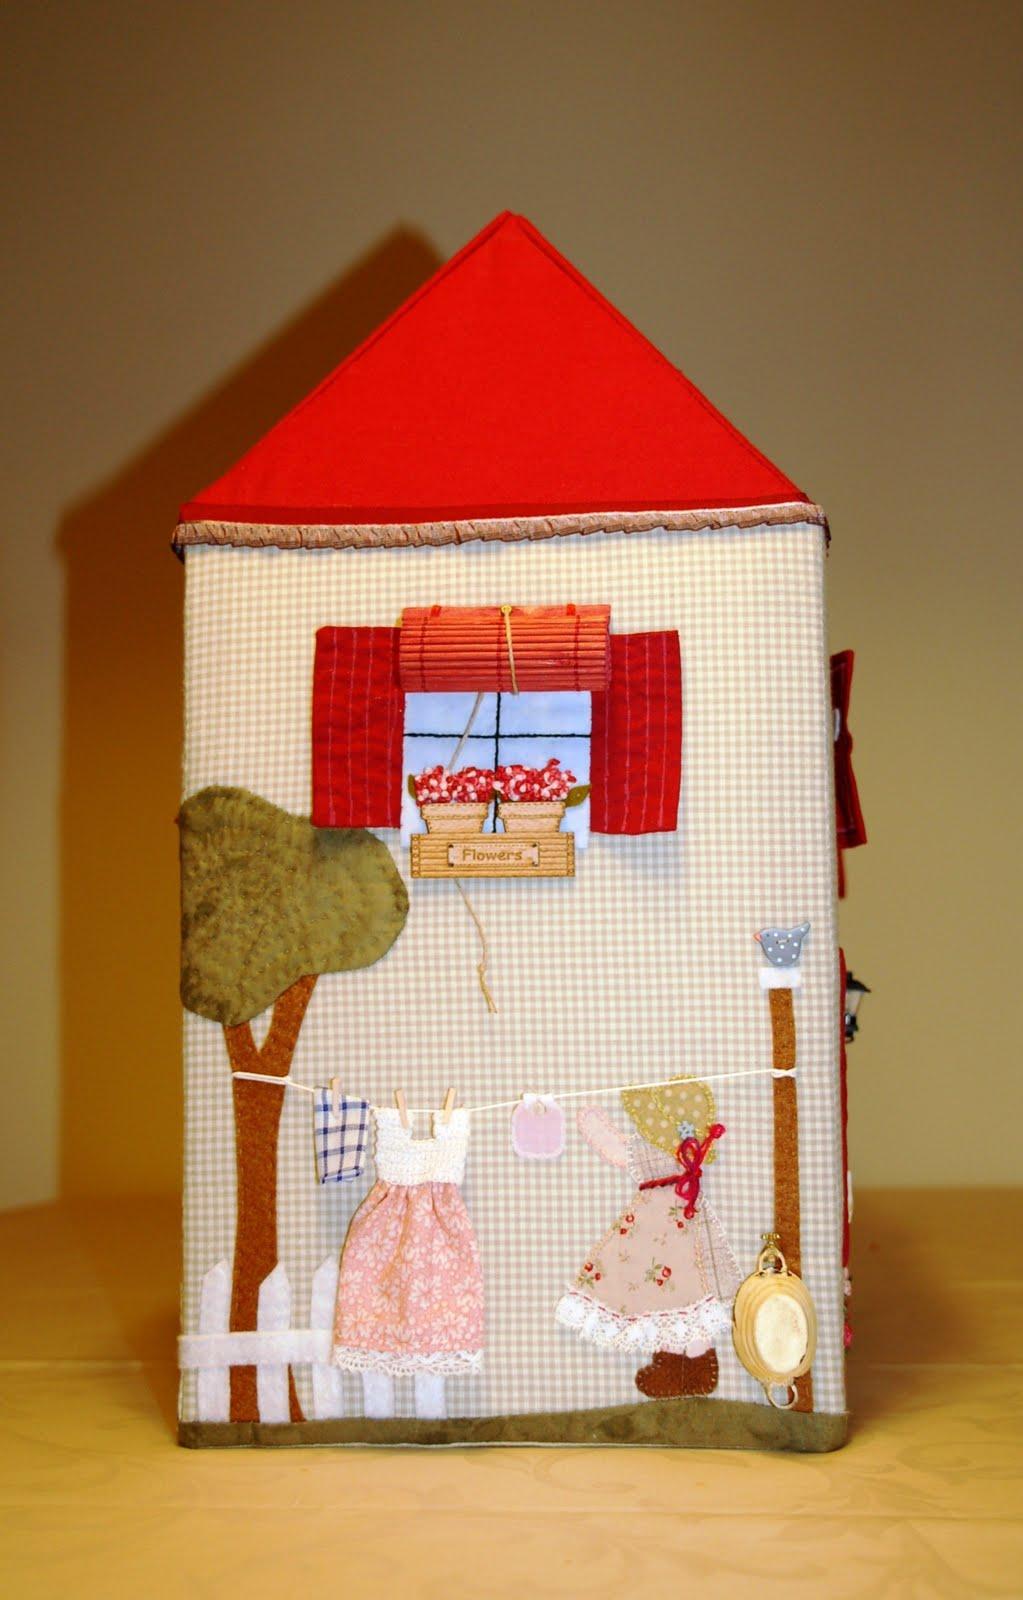 Olga quilt una casita para berni - Casas de patchwork ...